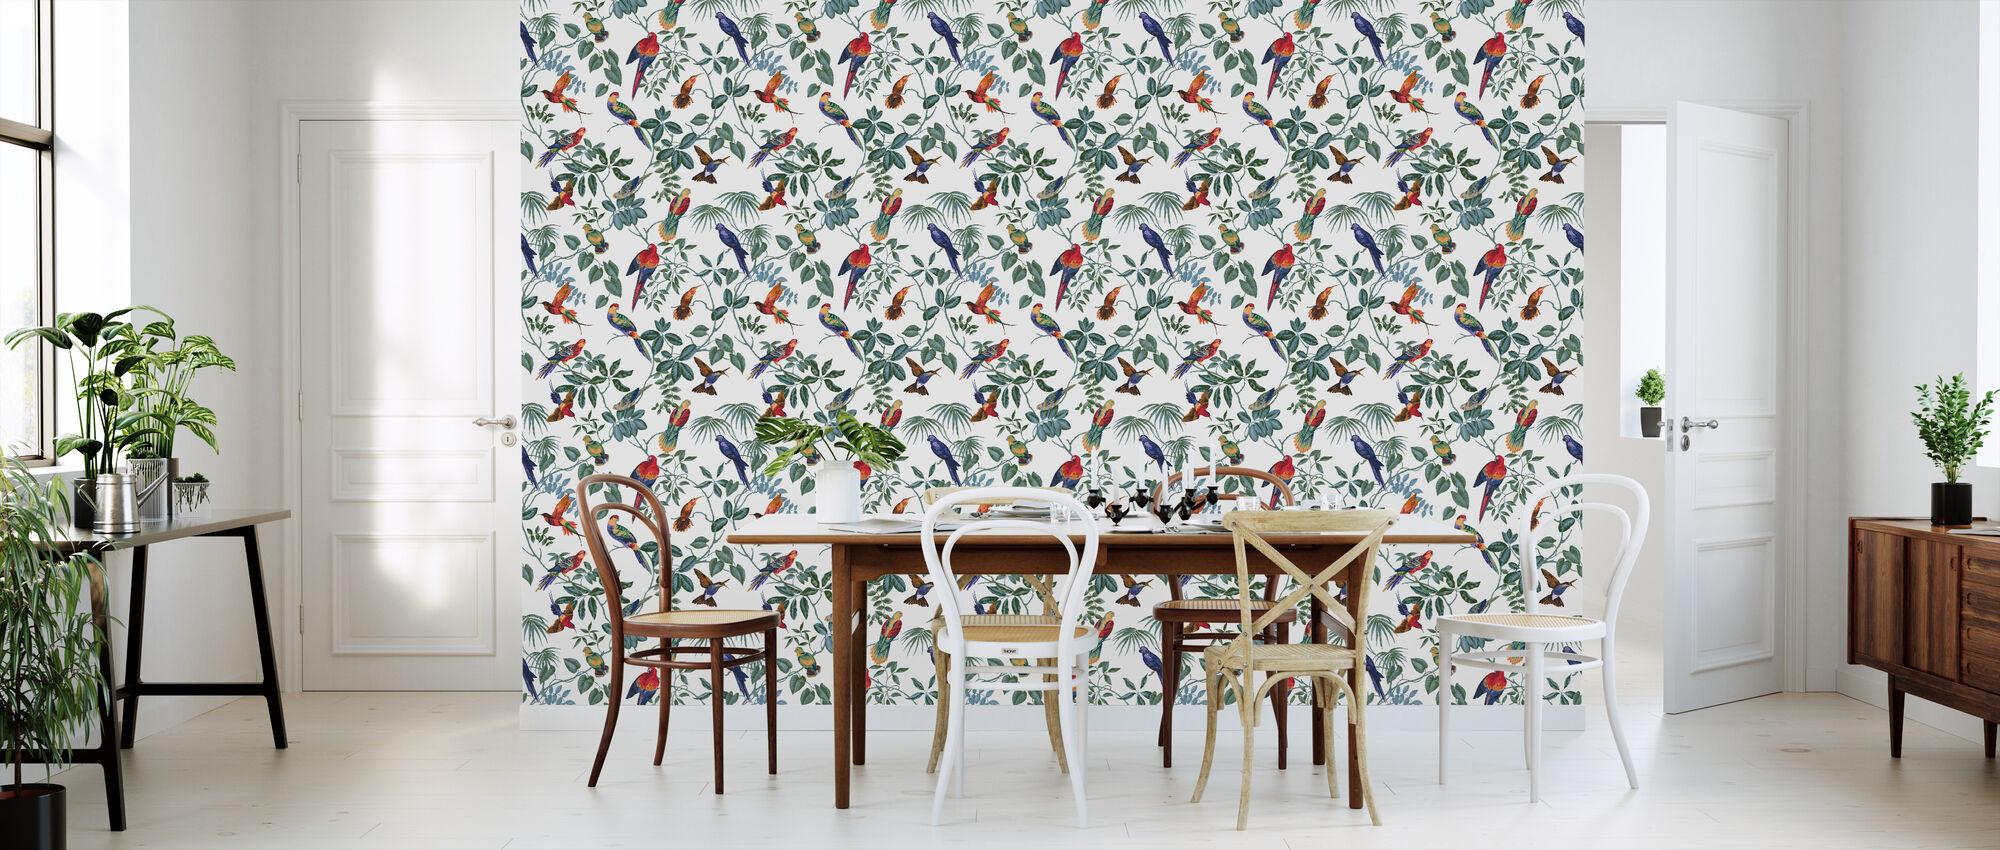 aviary multi original klassische tapete h chster qualit t photowall. Black Bedroom Furniture Sets. Home Design Ideas